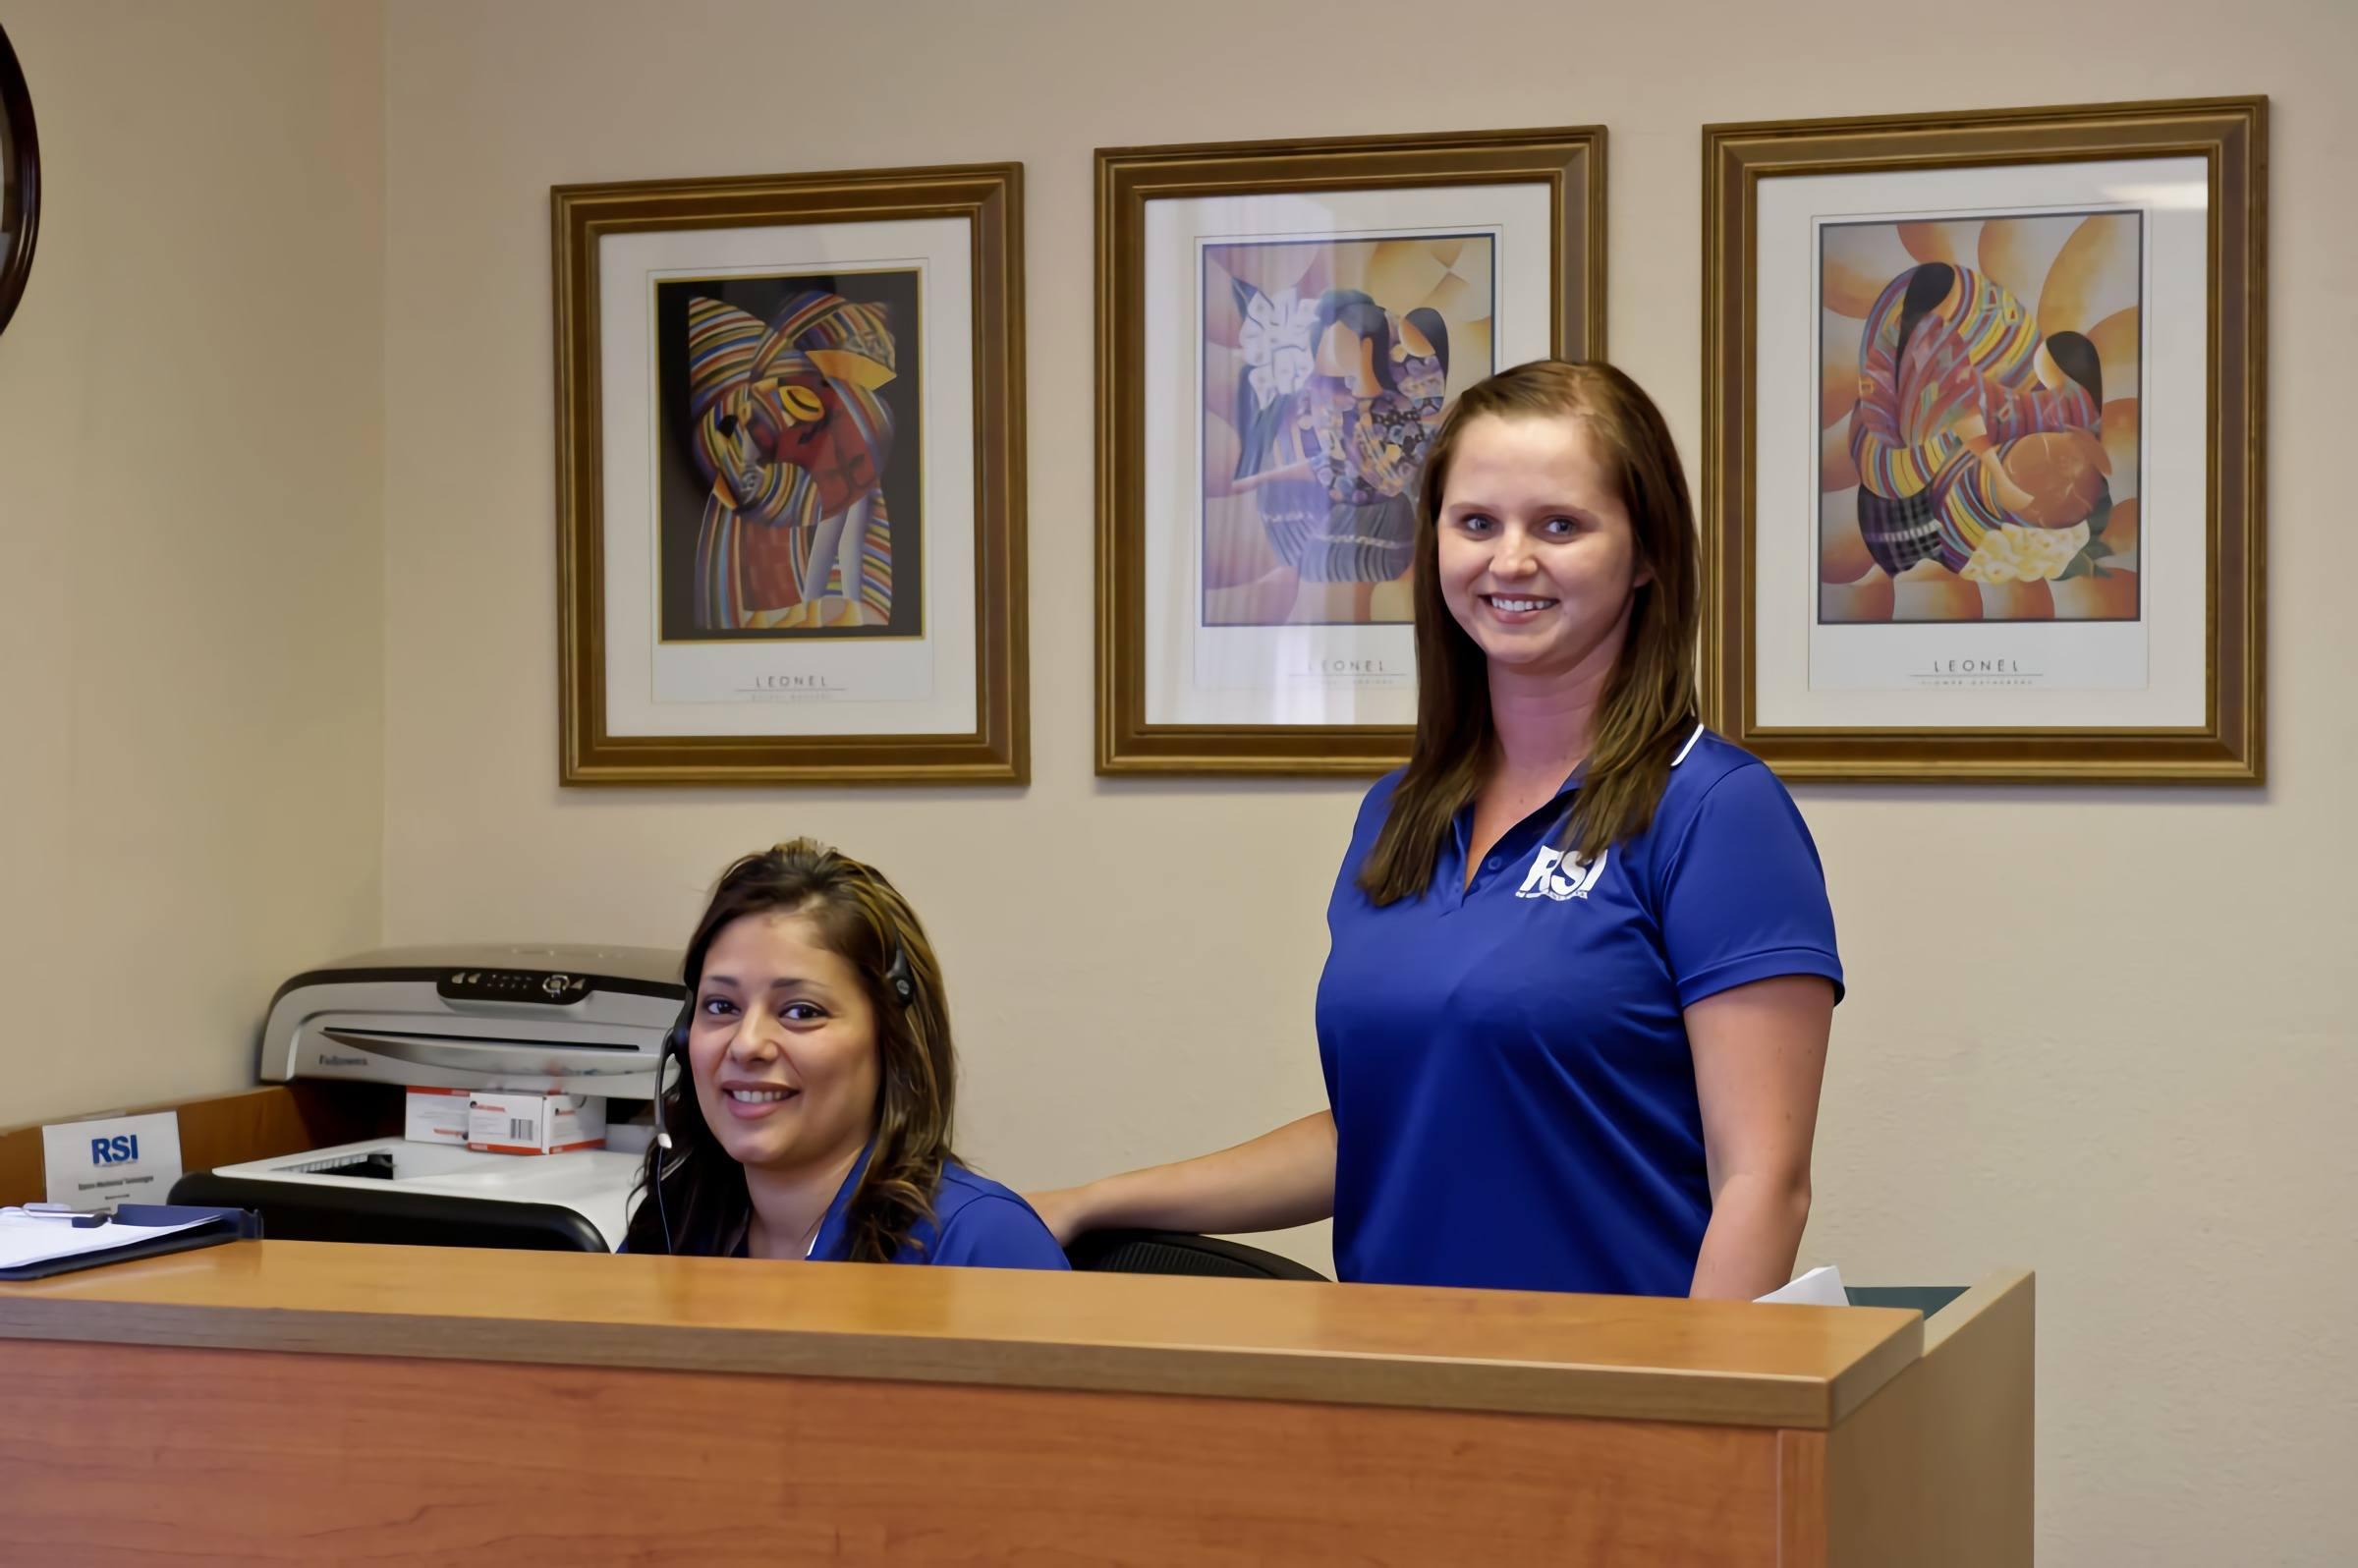 RSI Refrigeration School Training Phoenix Staff